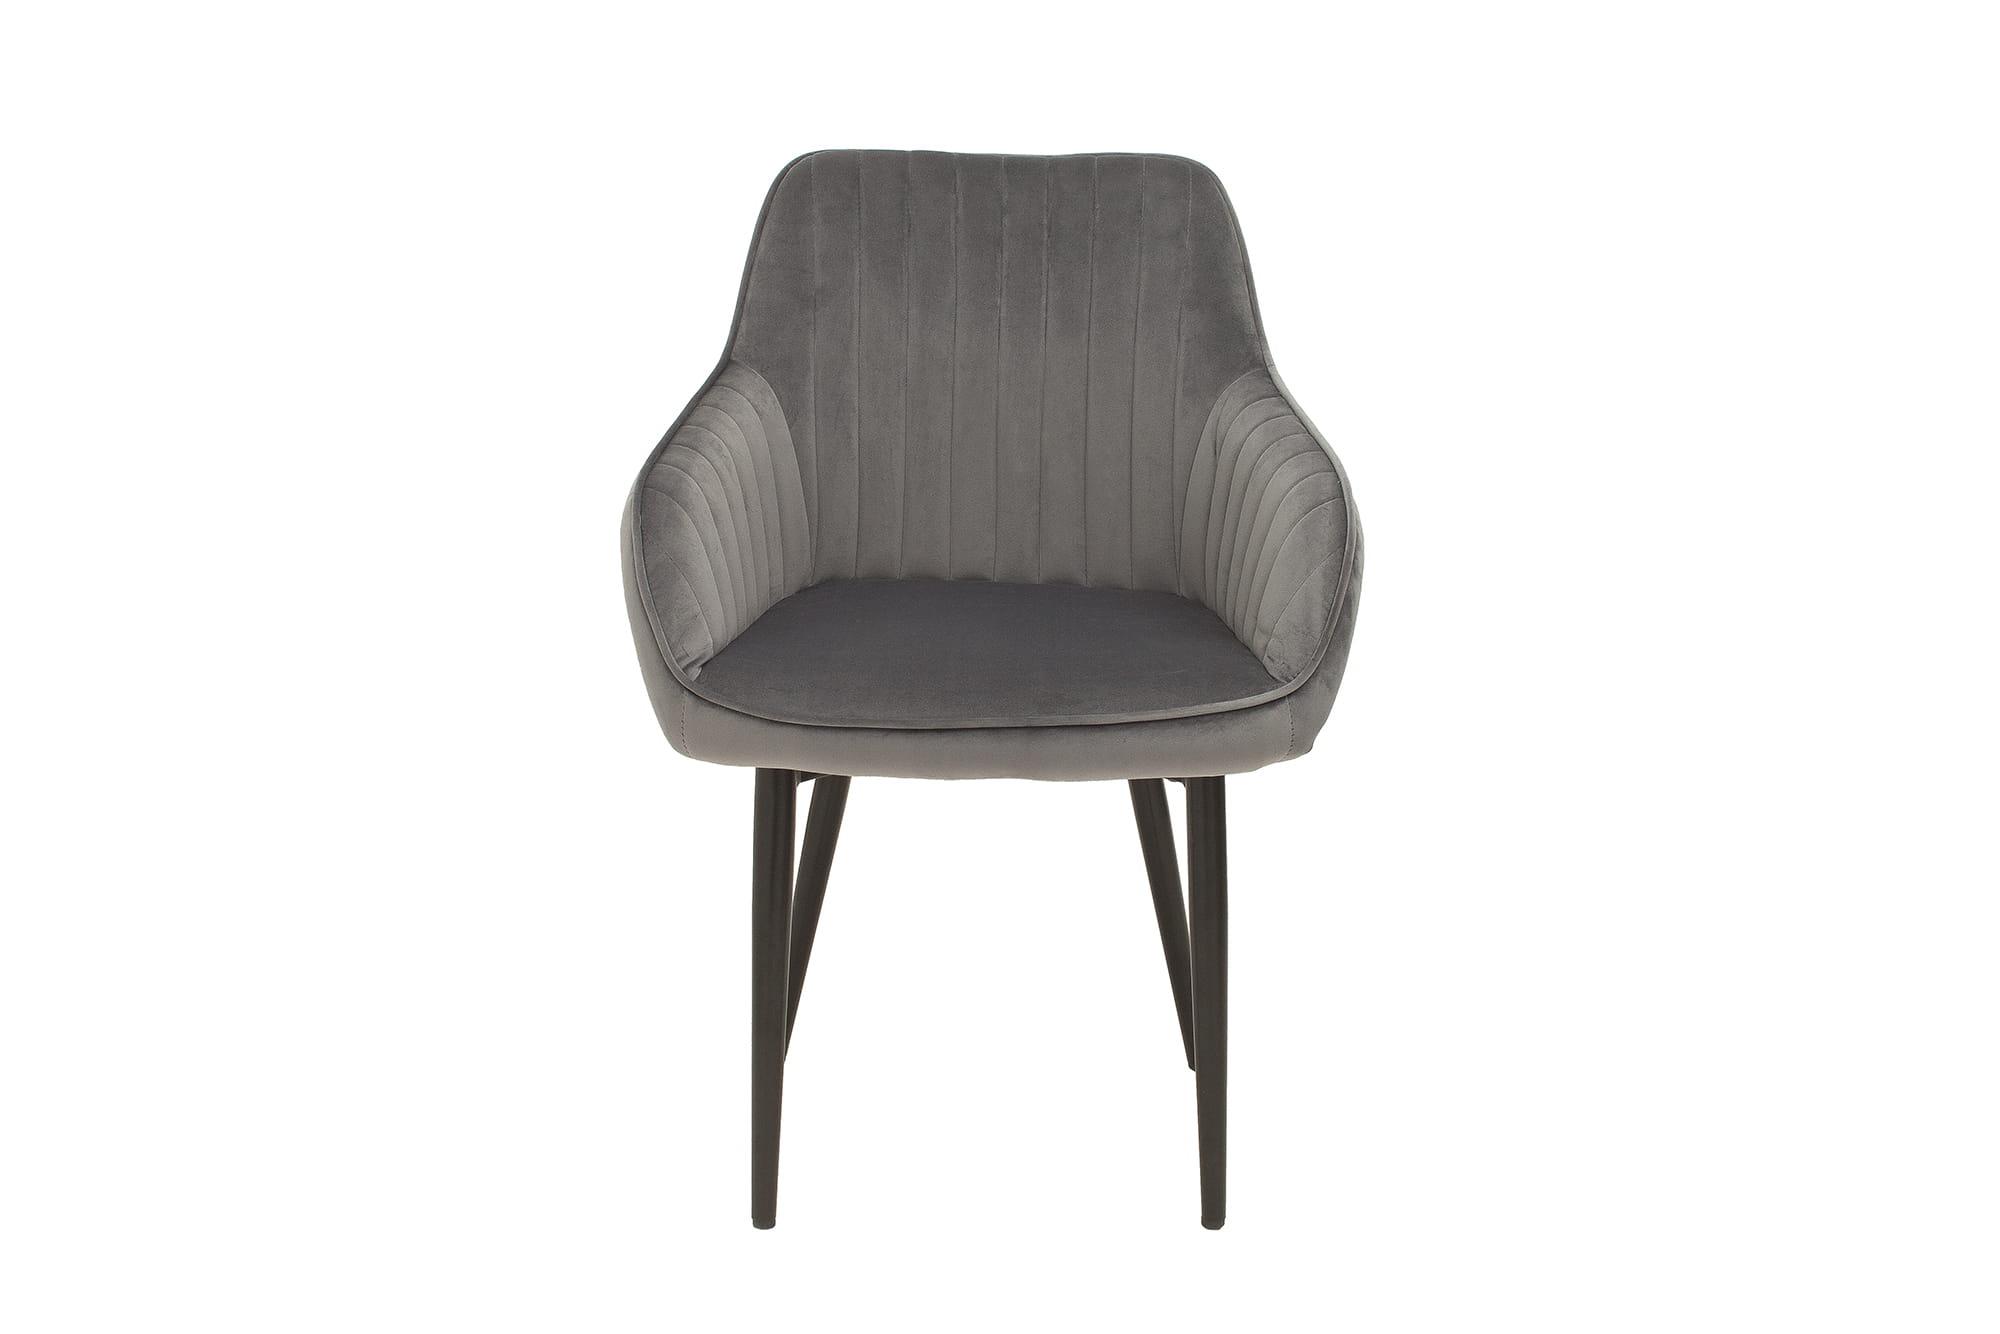 Krzesło Nitro srebrno-szare